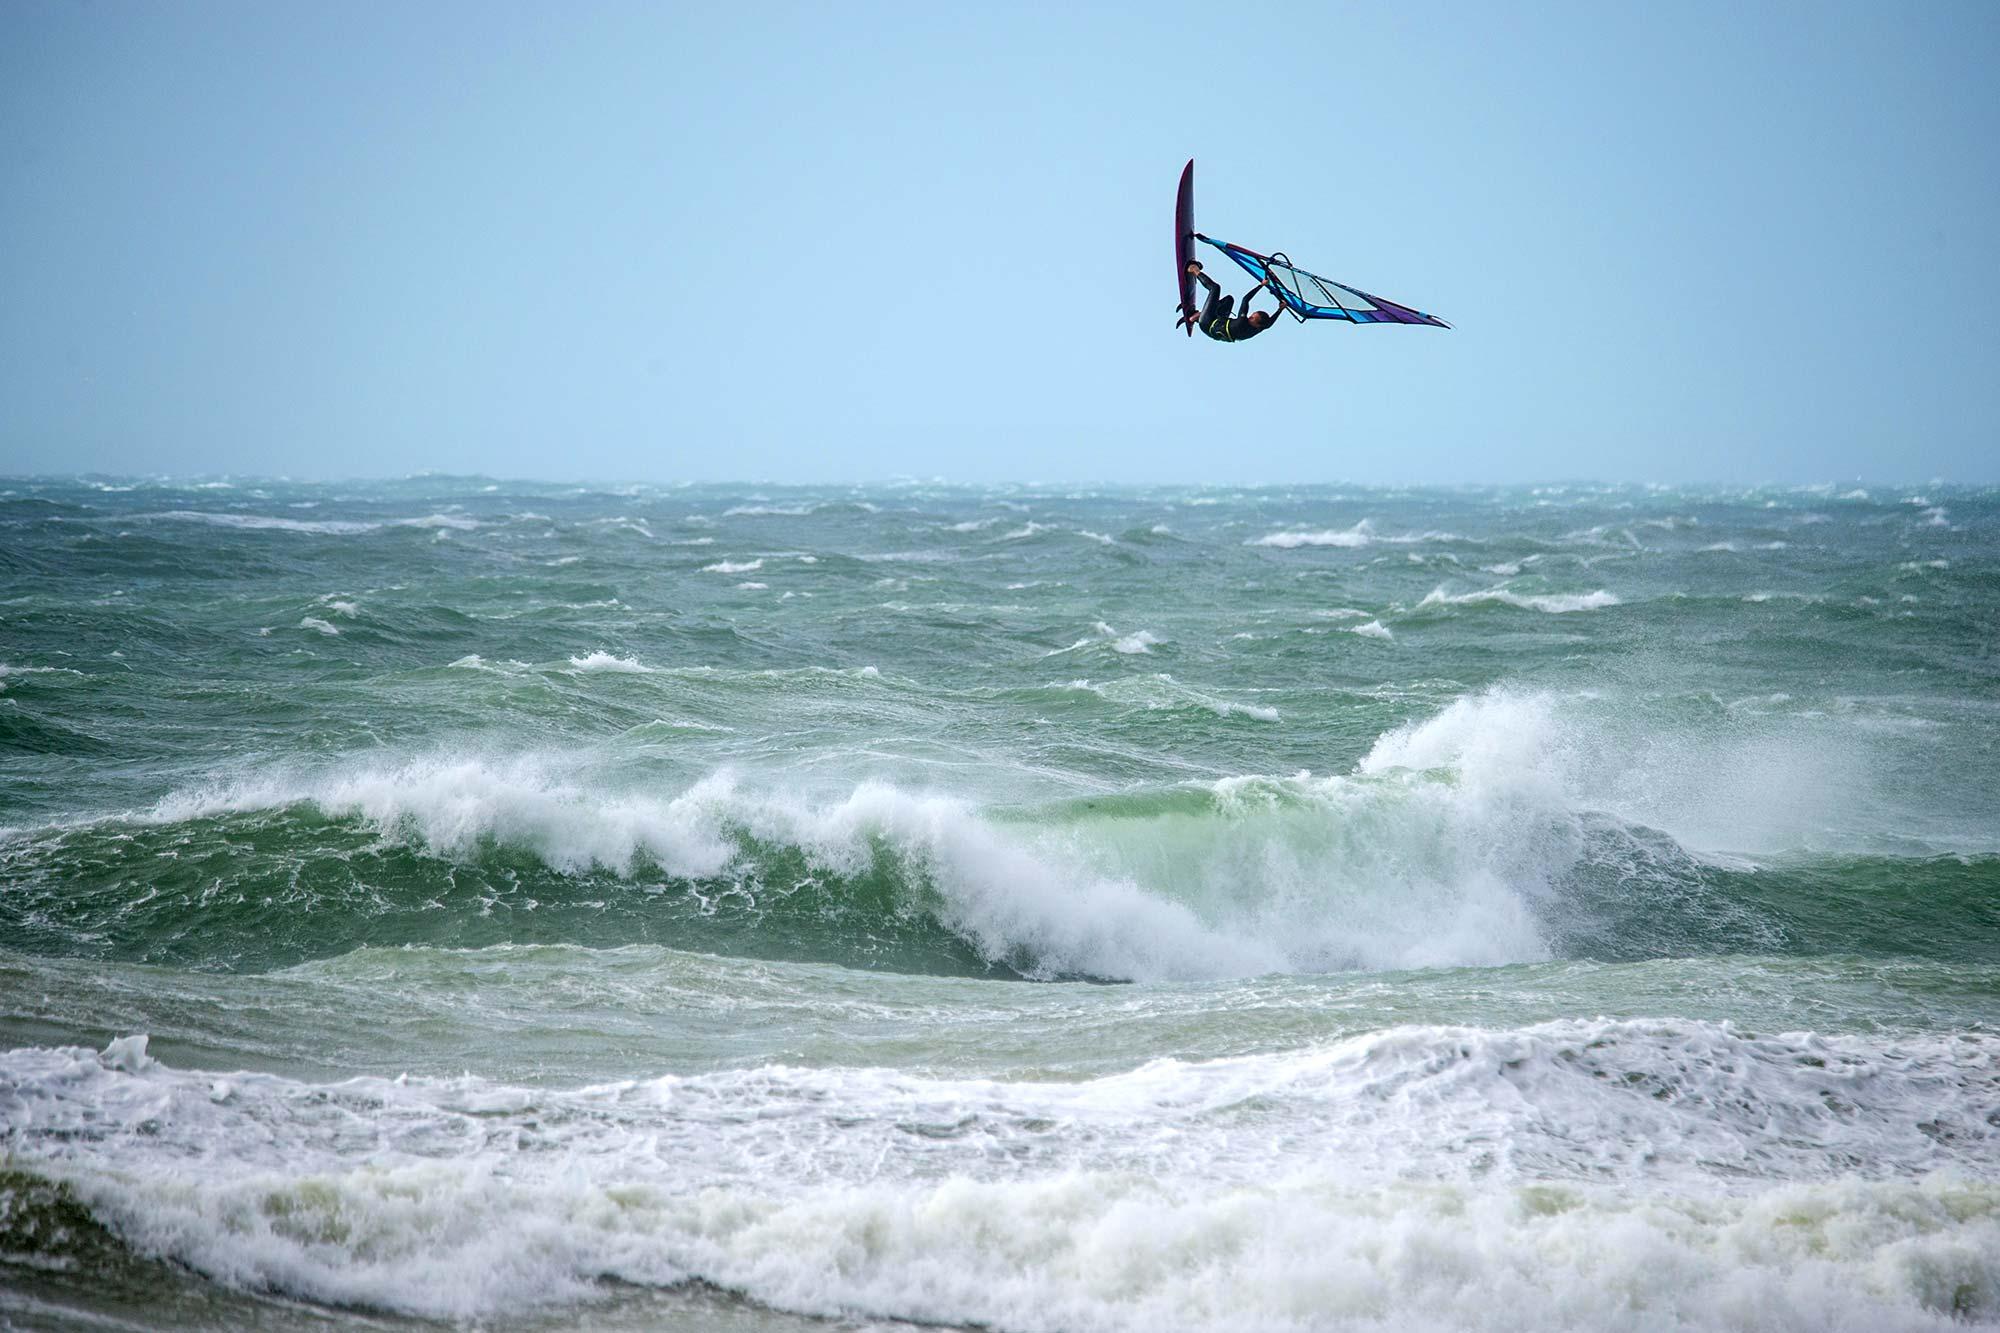 Windy Wissant Jp Australia